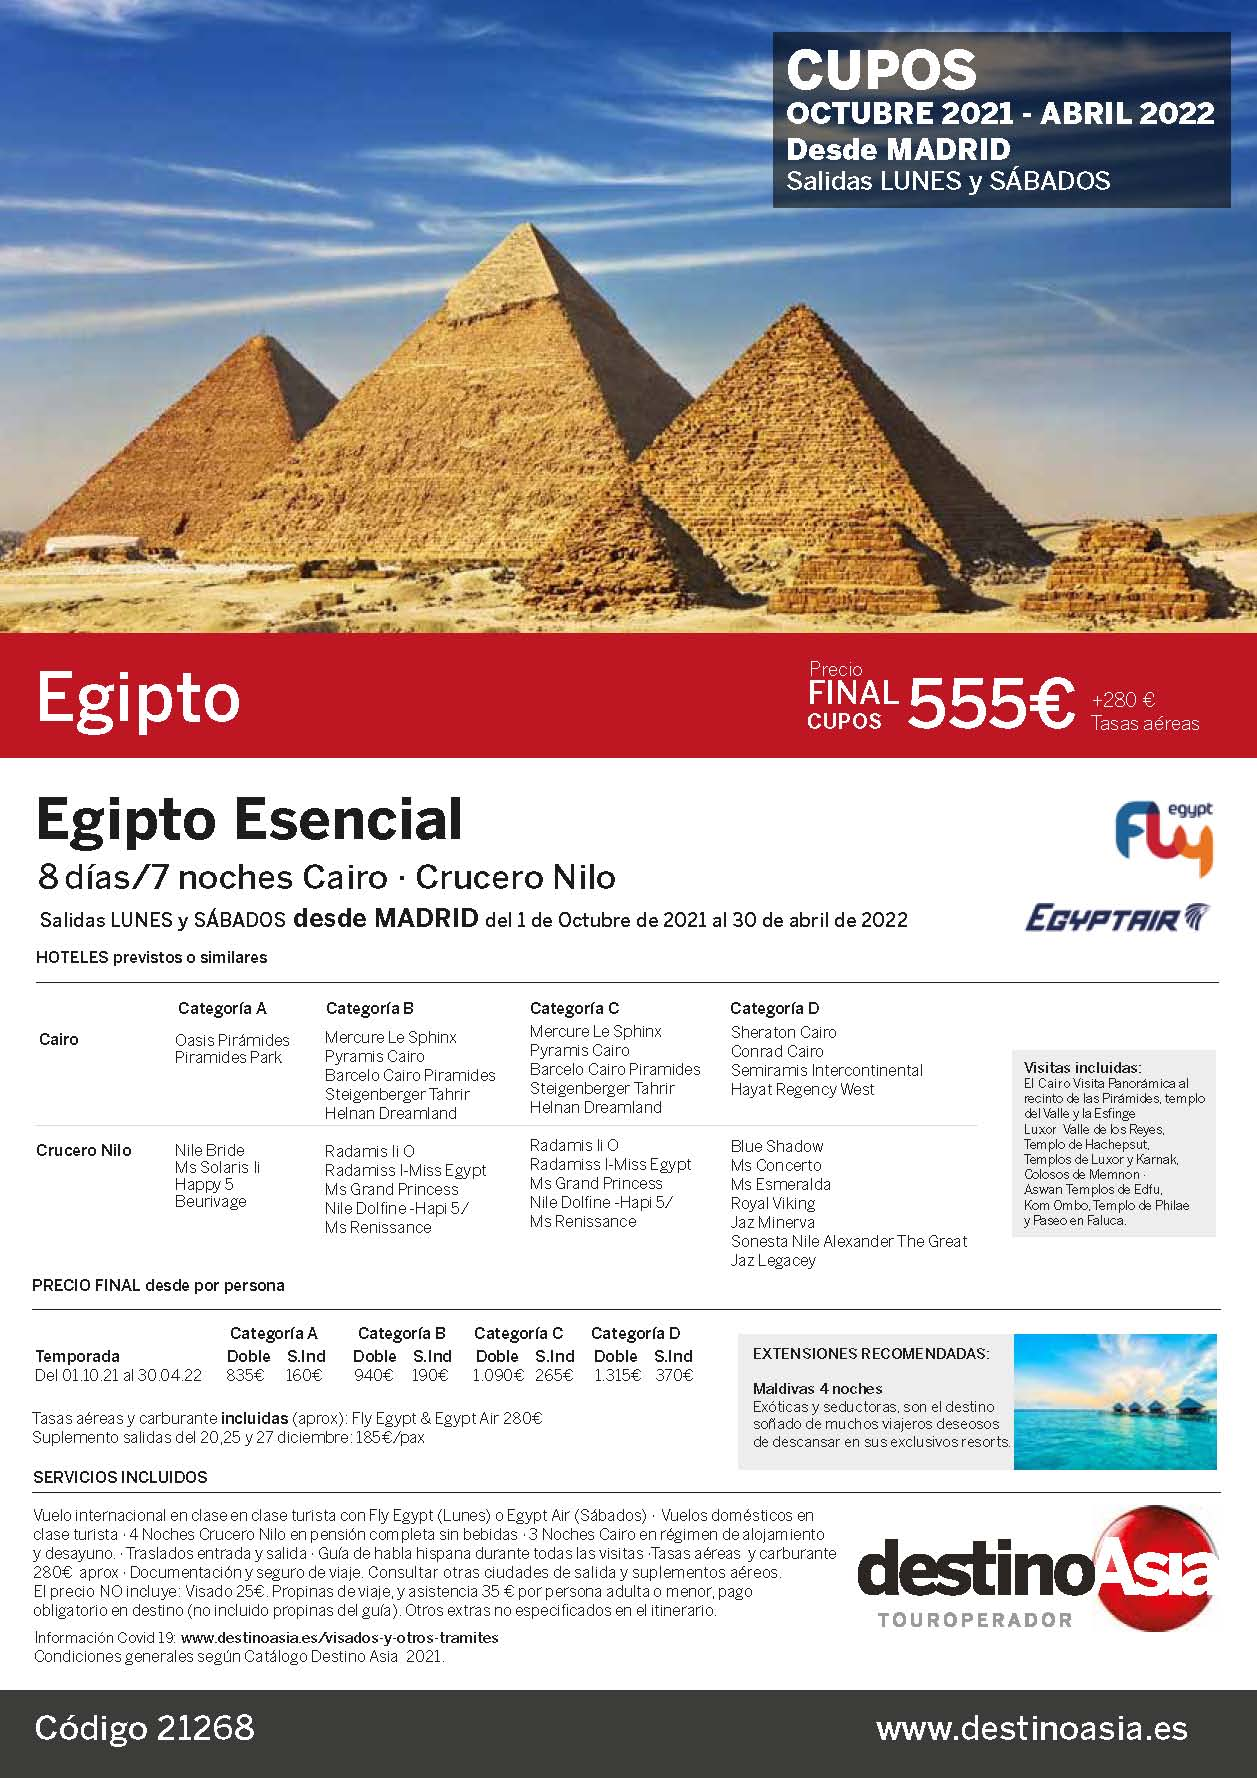 Ofertas Destino Asia Egipto Charter Octubre 2021 a Abril 2022 salidas desde Madrid